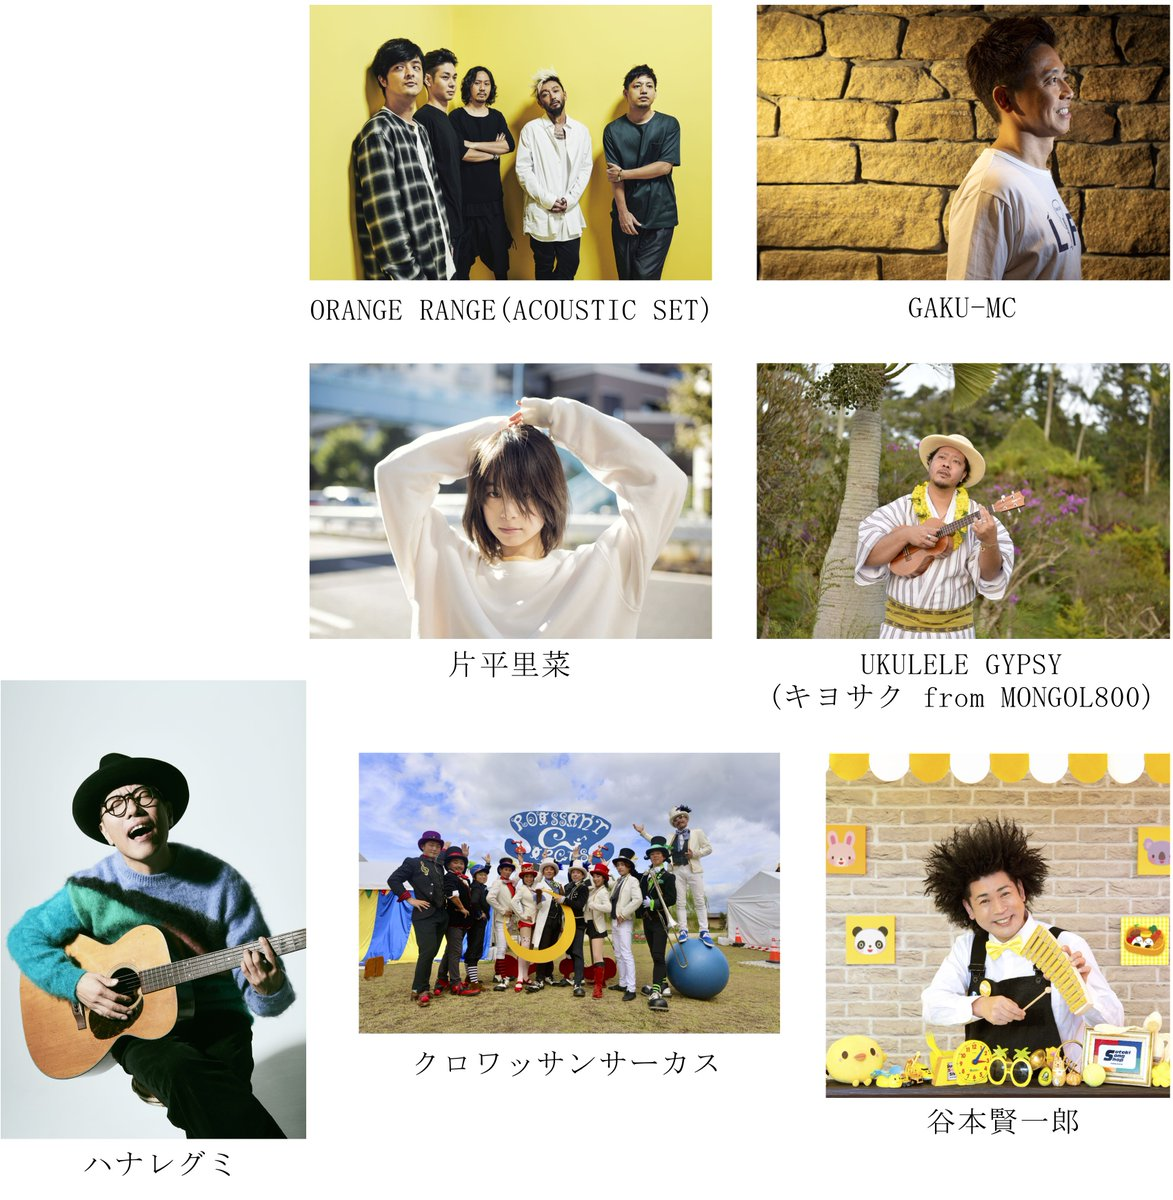 ORANGE RANGE(ACOUSTIC SET)、ハナレグミなど21組のアーティストが福島に集結! SONG OF THE EARTH 311 - FUKUSH...